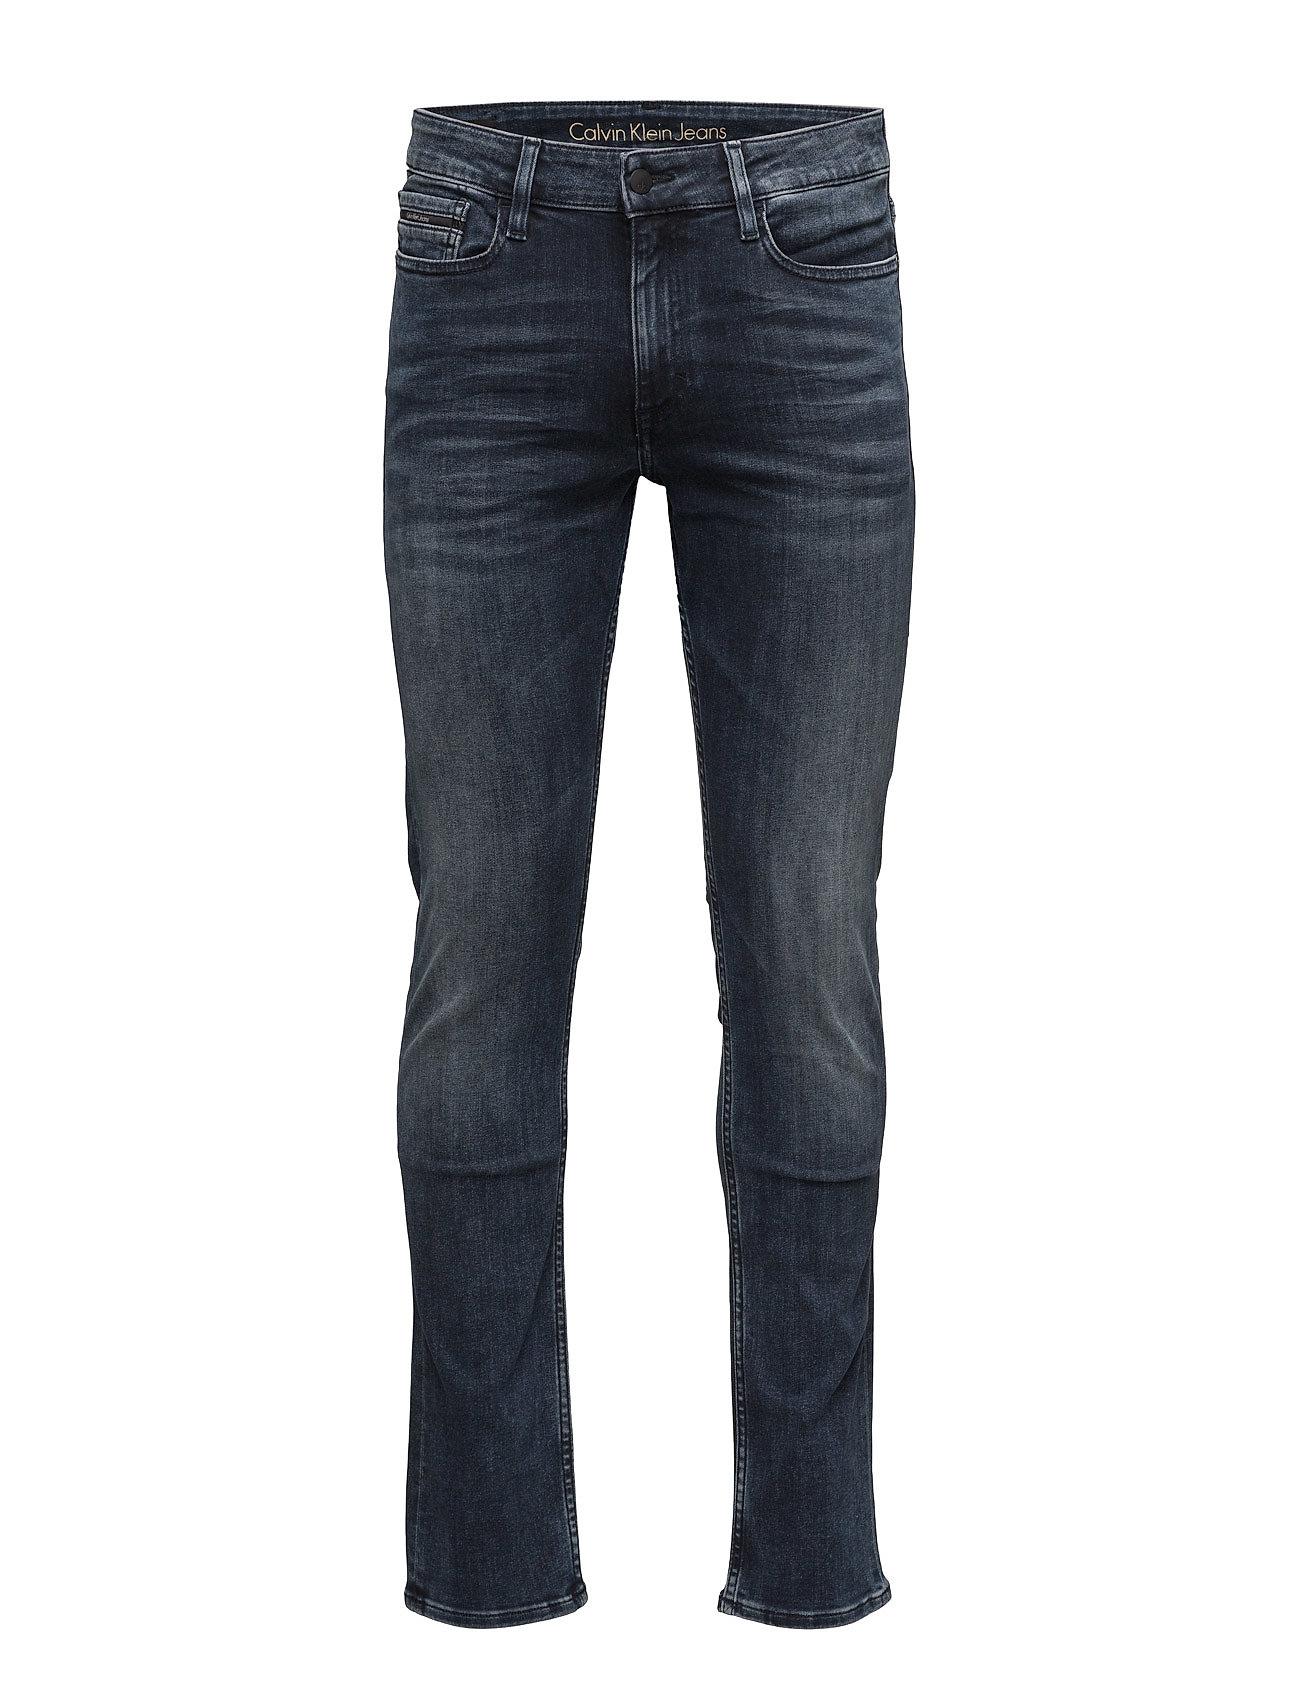 calvin klein jeans – Slim straight - noct på boozt.com dk